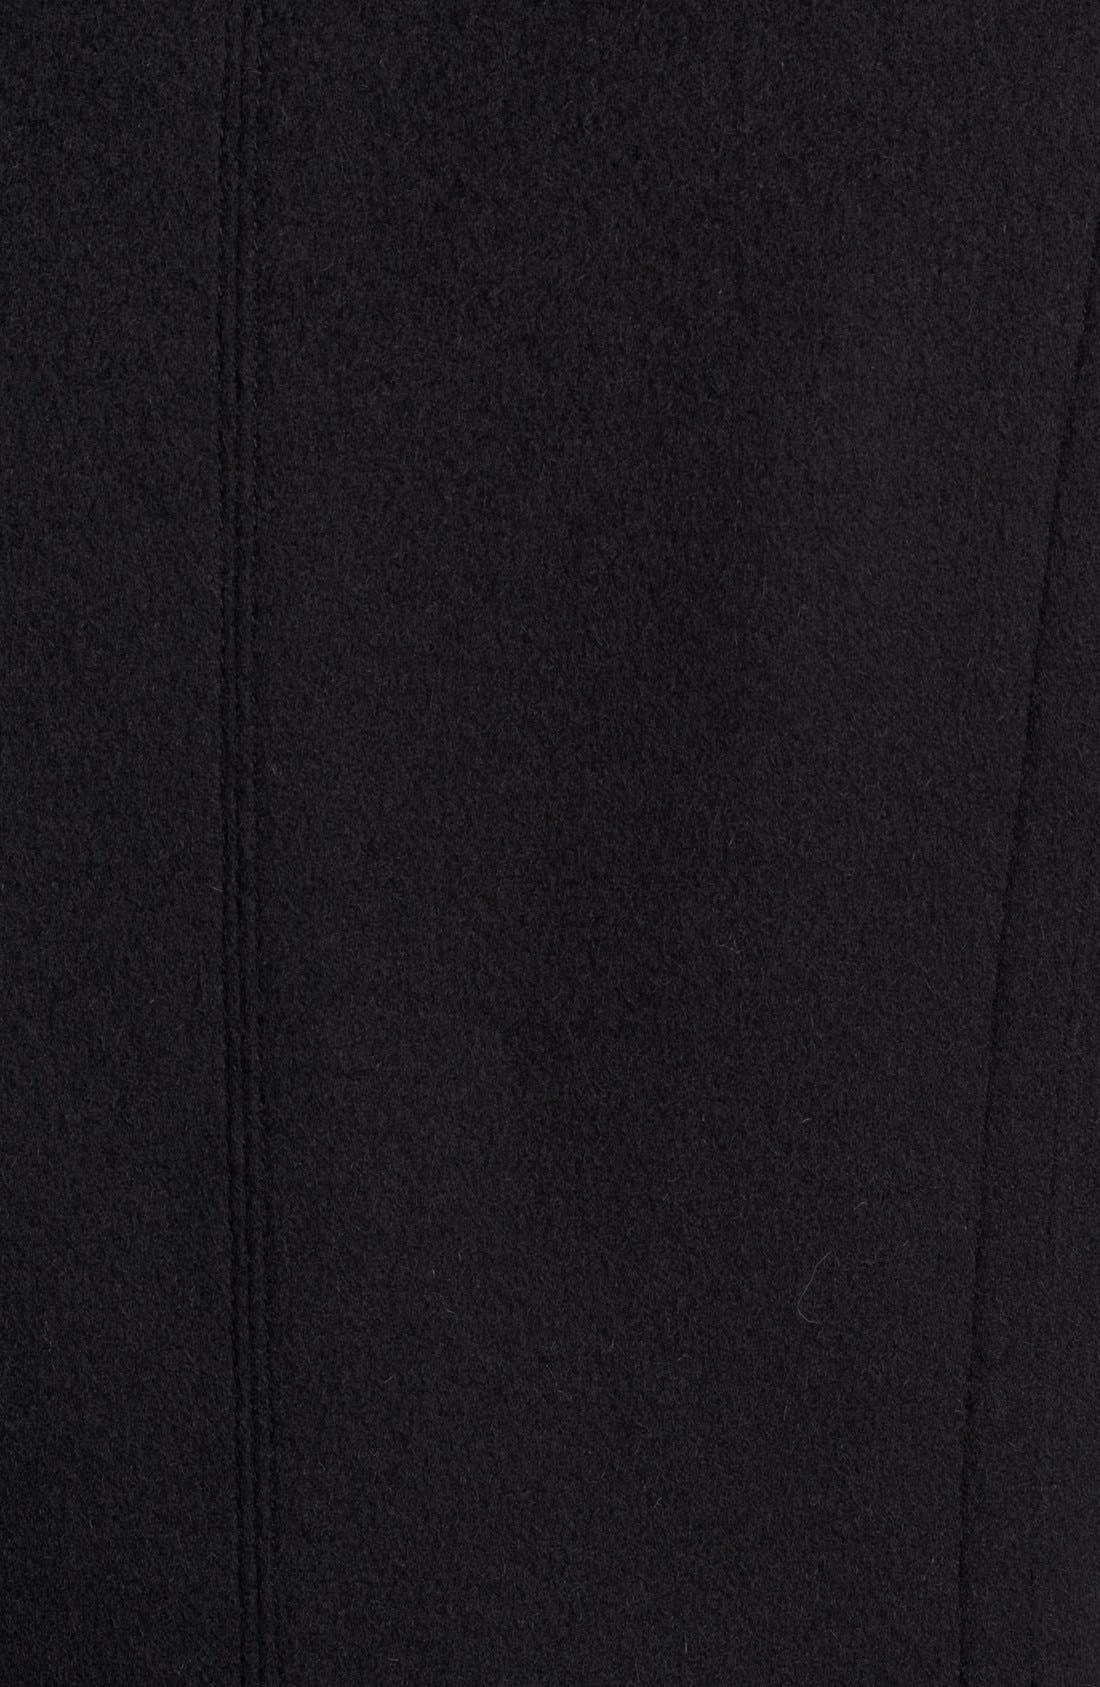 Alternate Image 3  - Burberry London Pleated Back Wool & Cashmere Coat